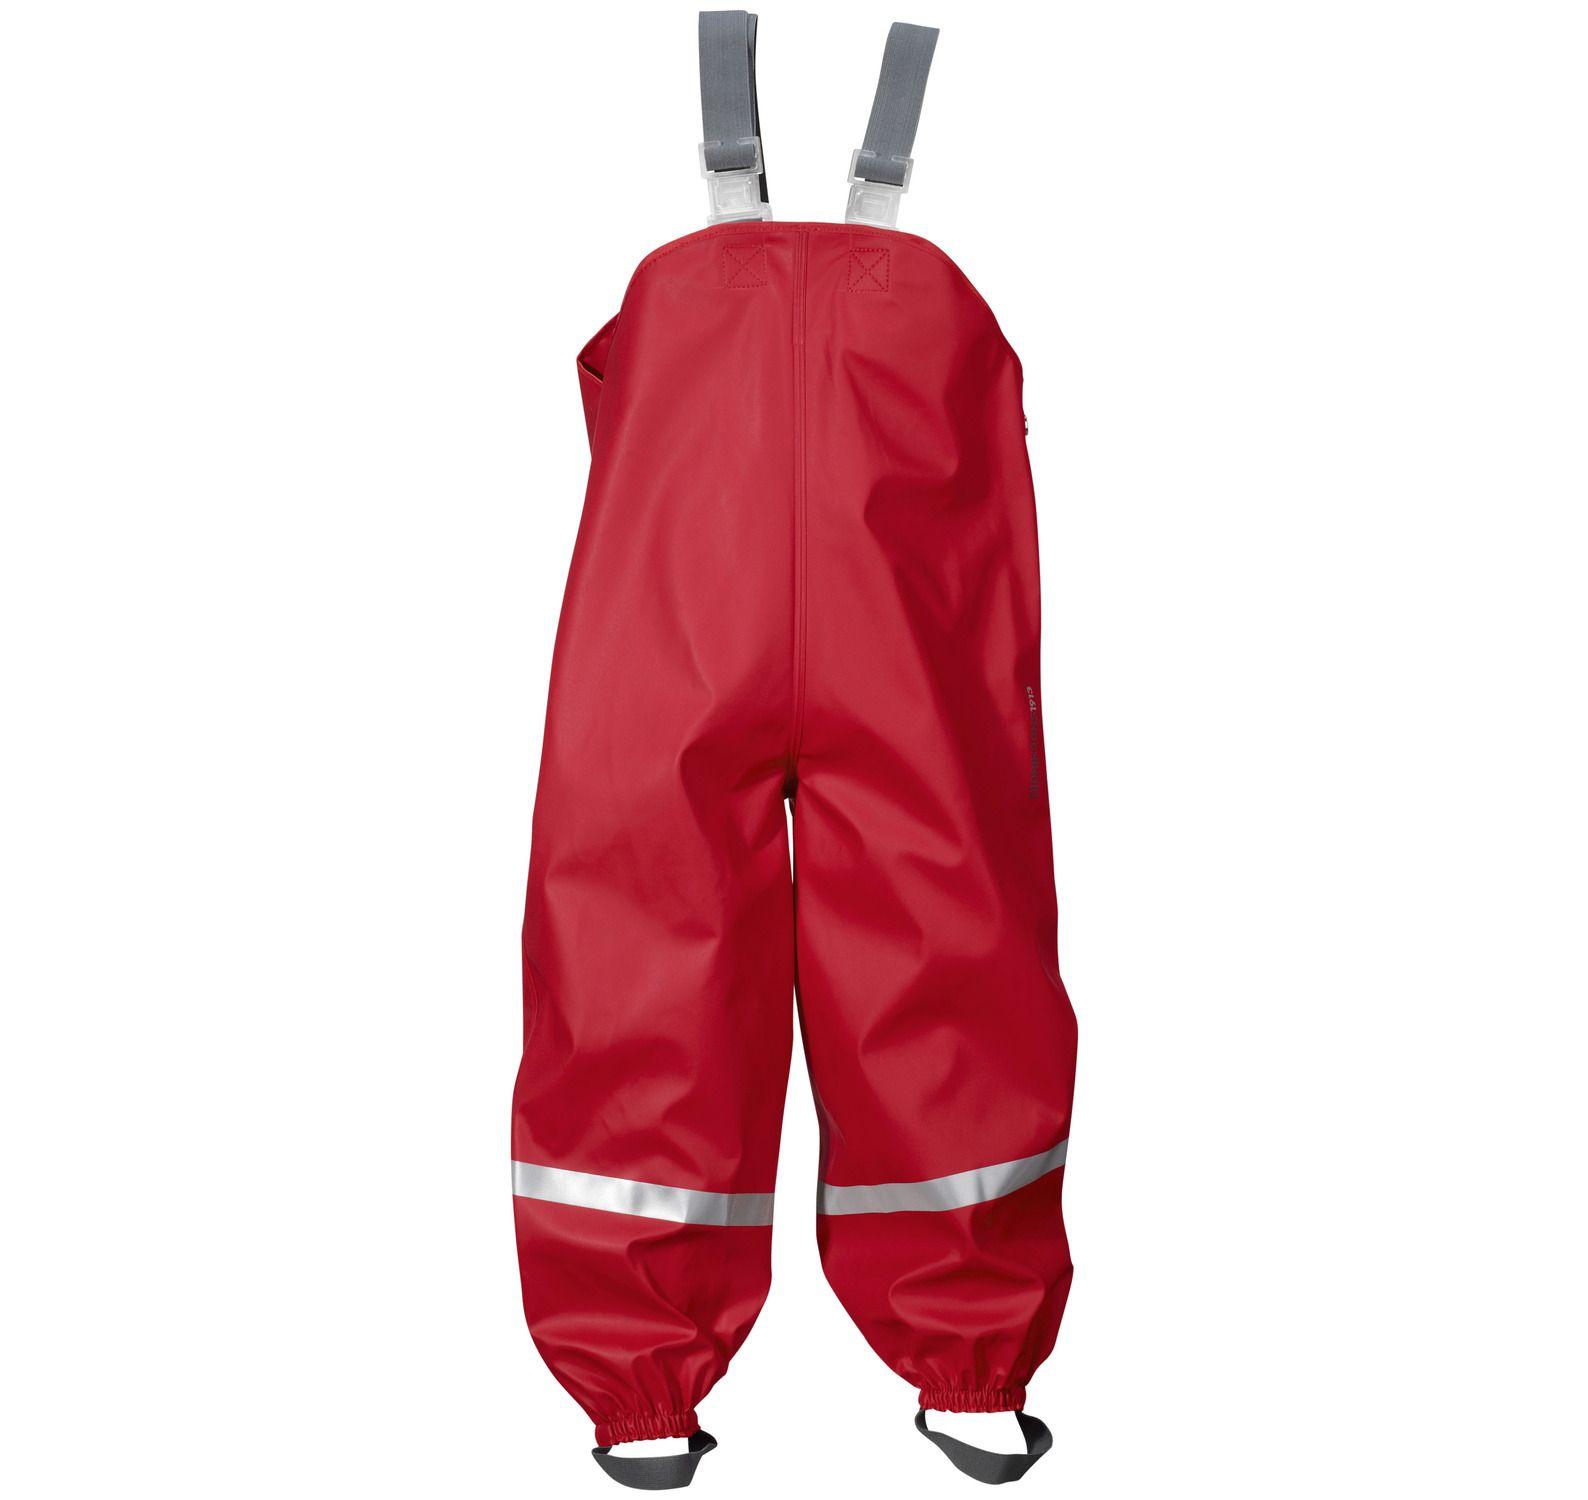 Plaskeman Pants, Flag Red, 120, Didriksons Regnkläder